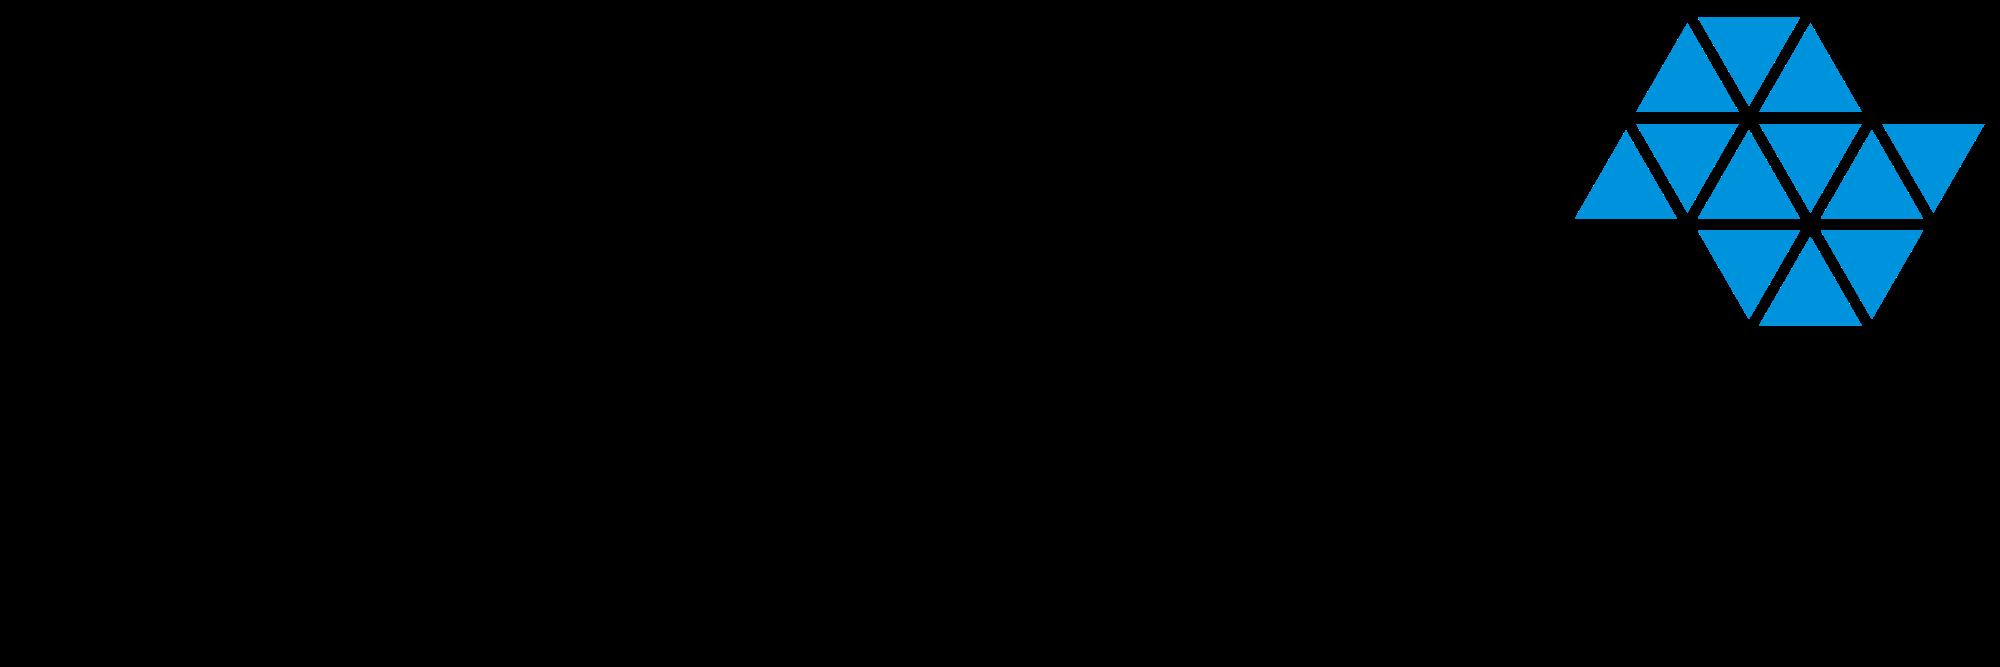 Logotipo Unesp